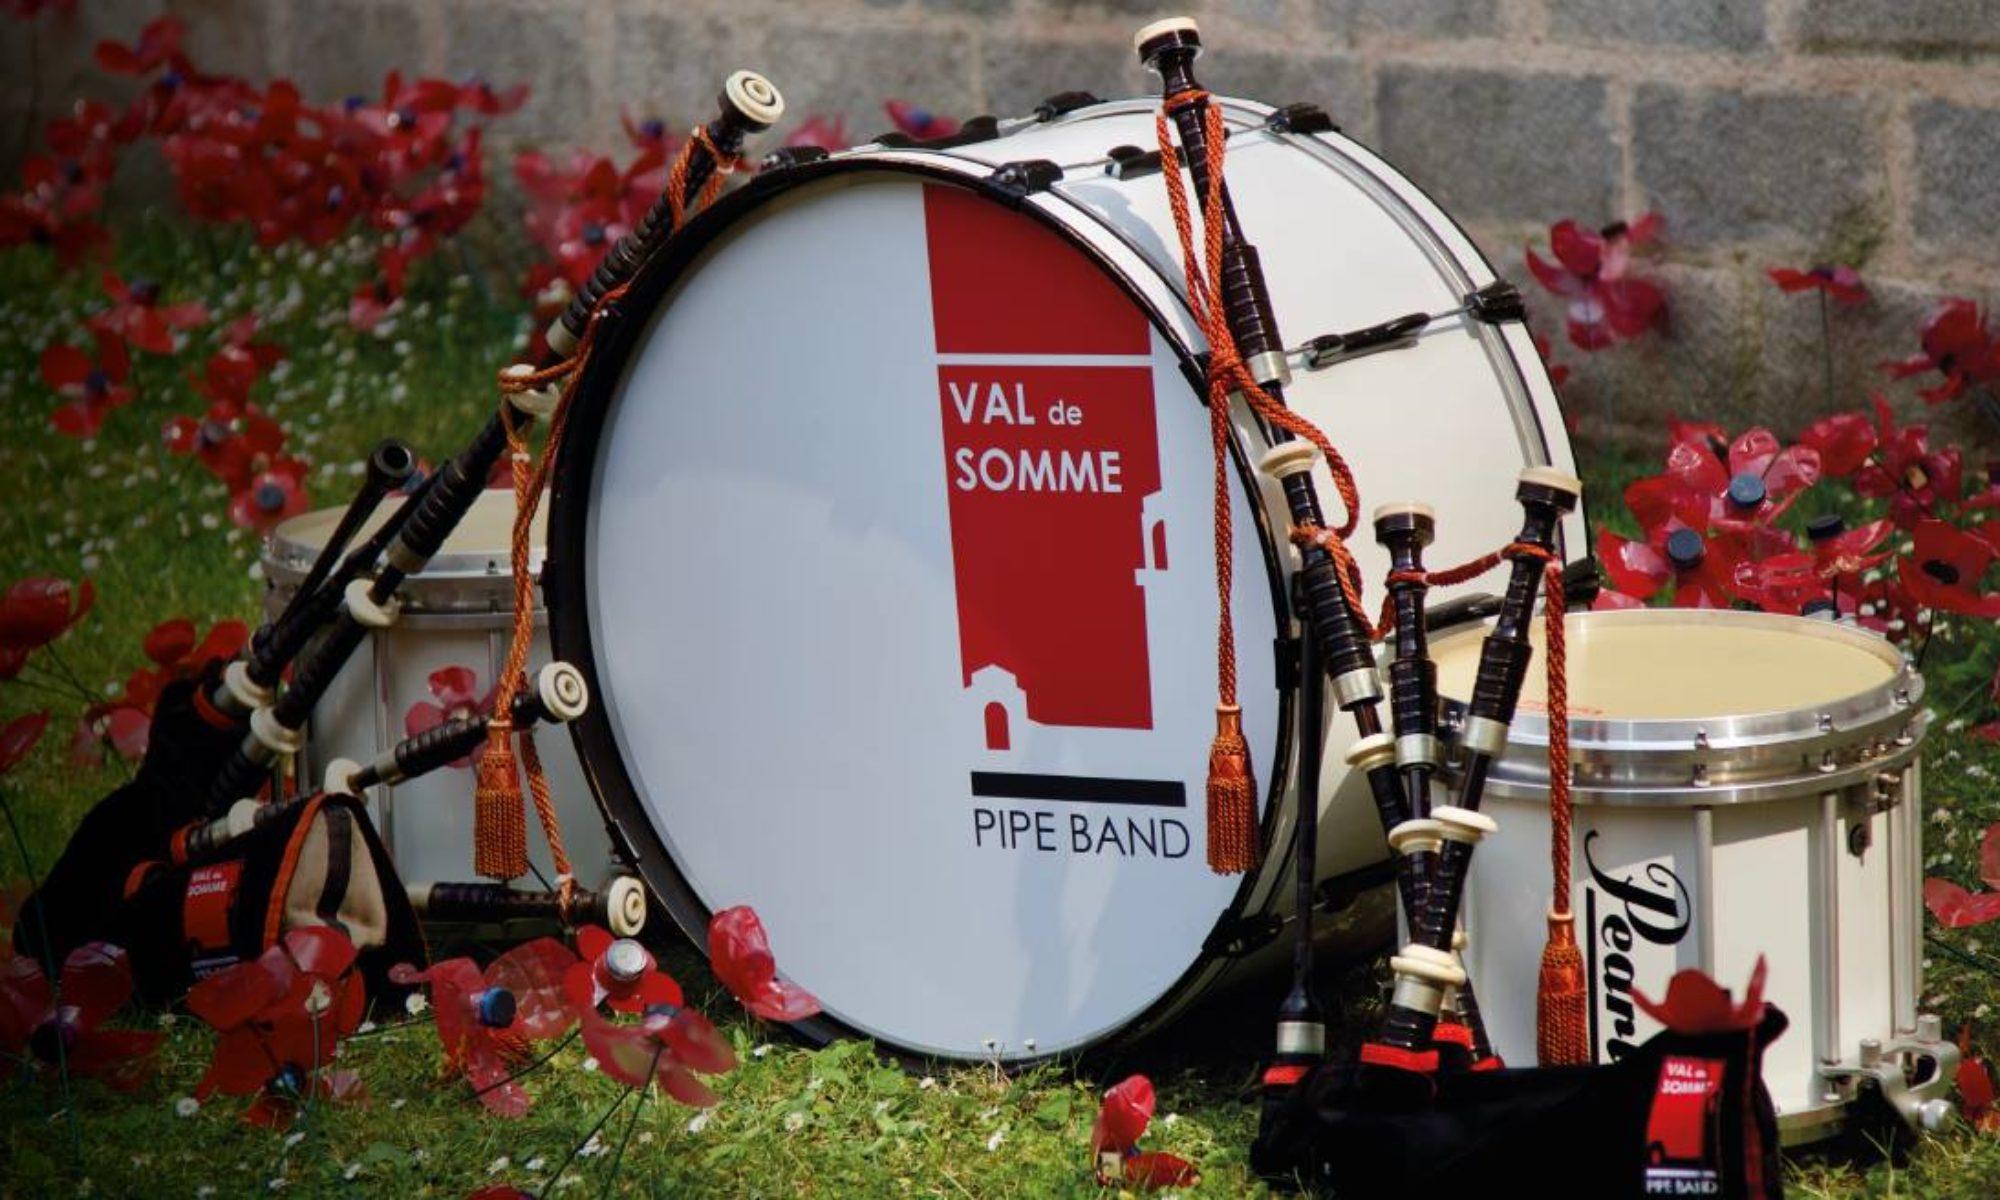 Pipe Band du Val de Somme